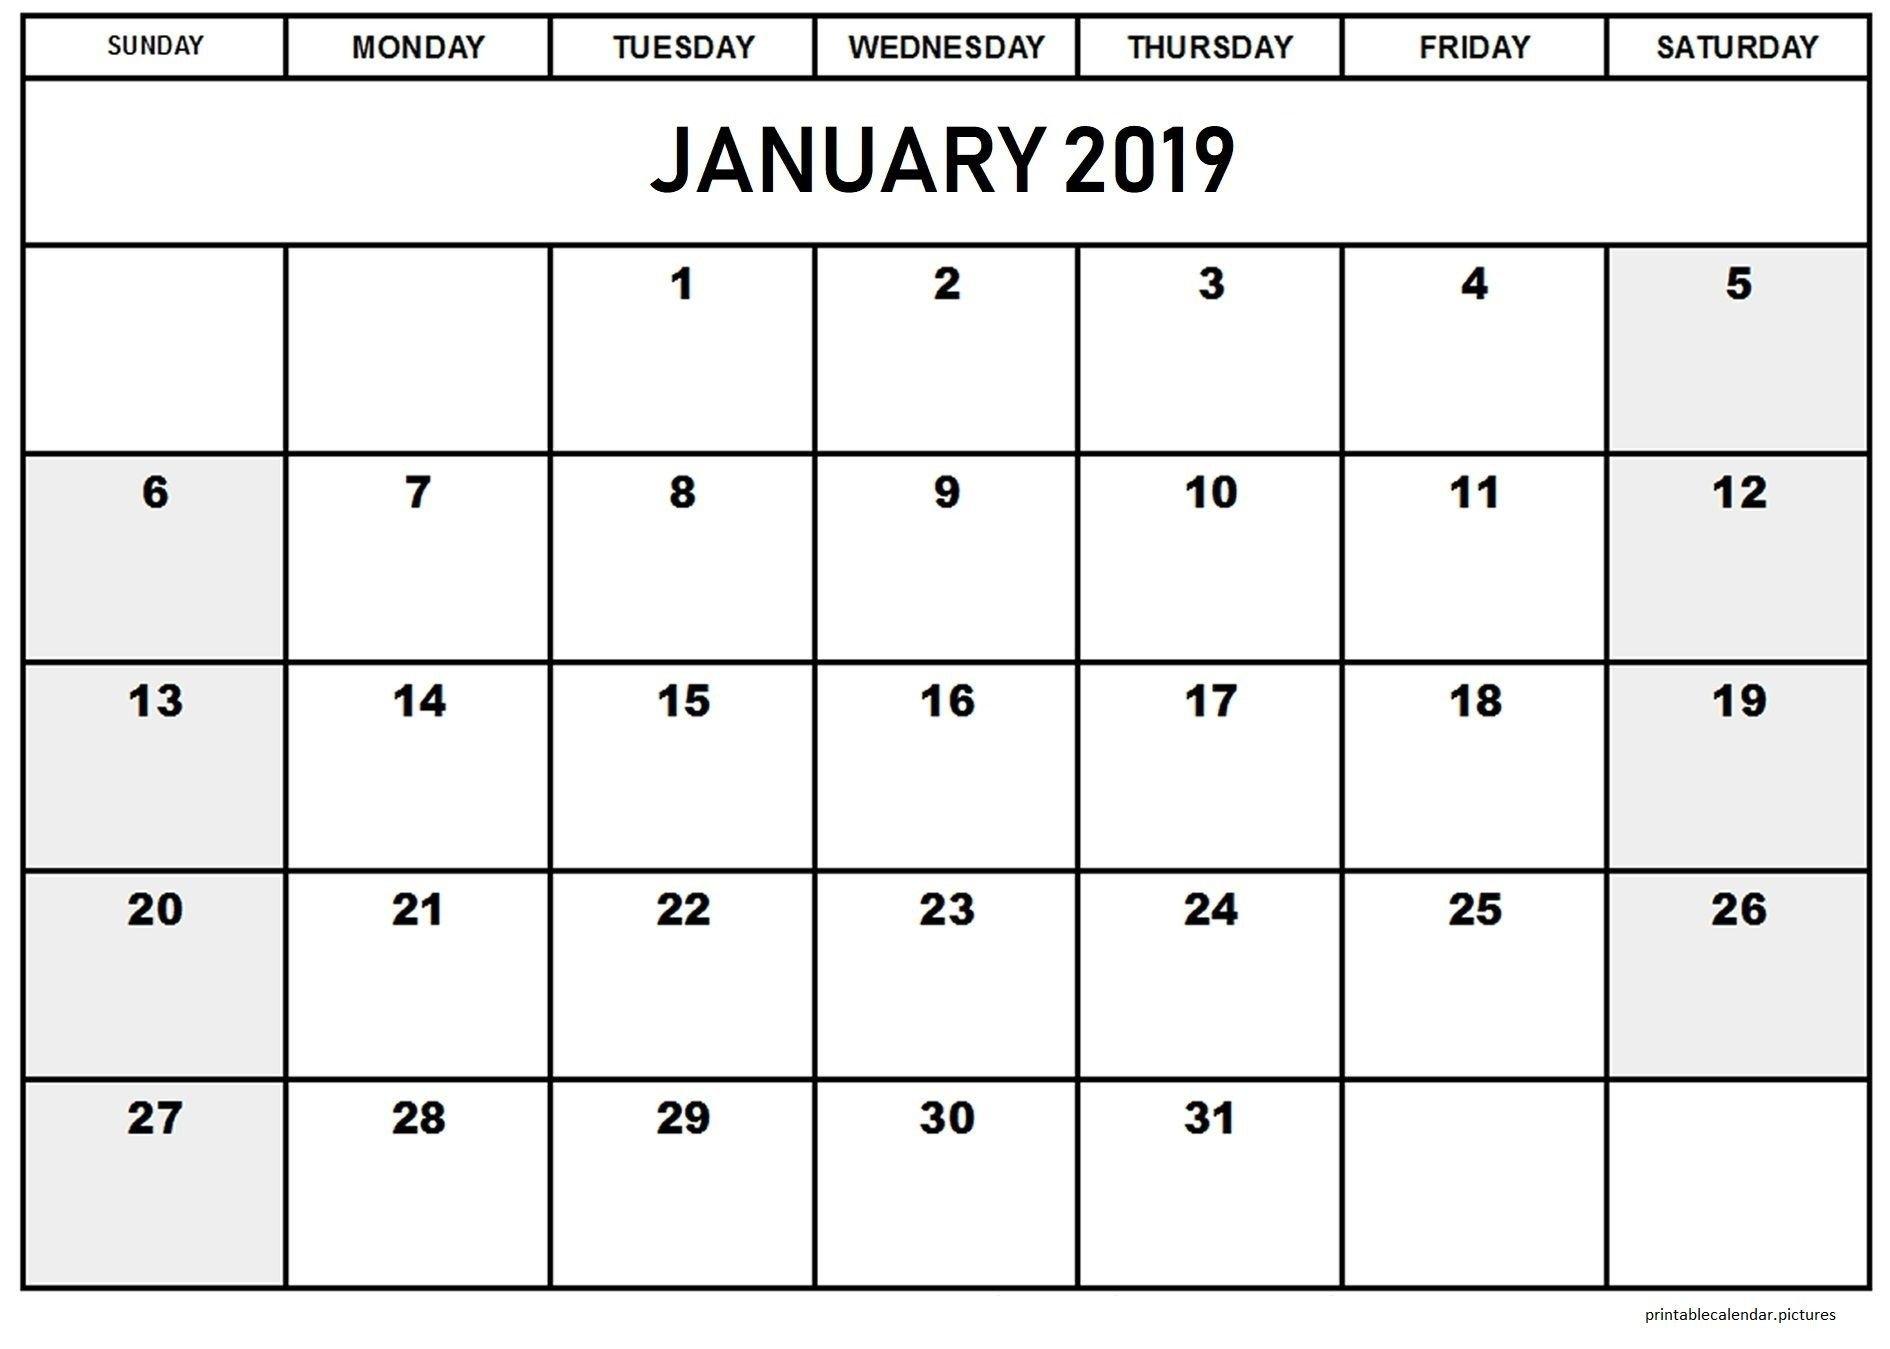 Free Printable Calendar Templates January 2019 | Google Docs : A Calendar 2019 Google